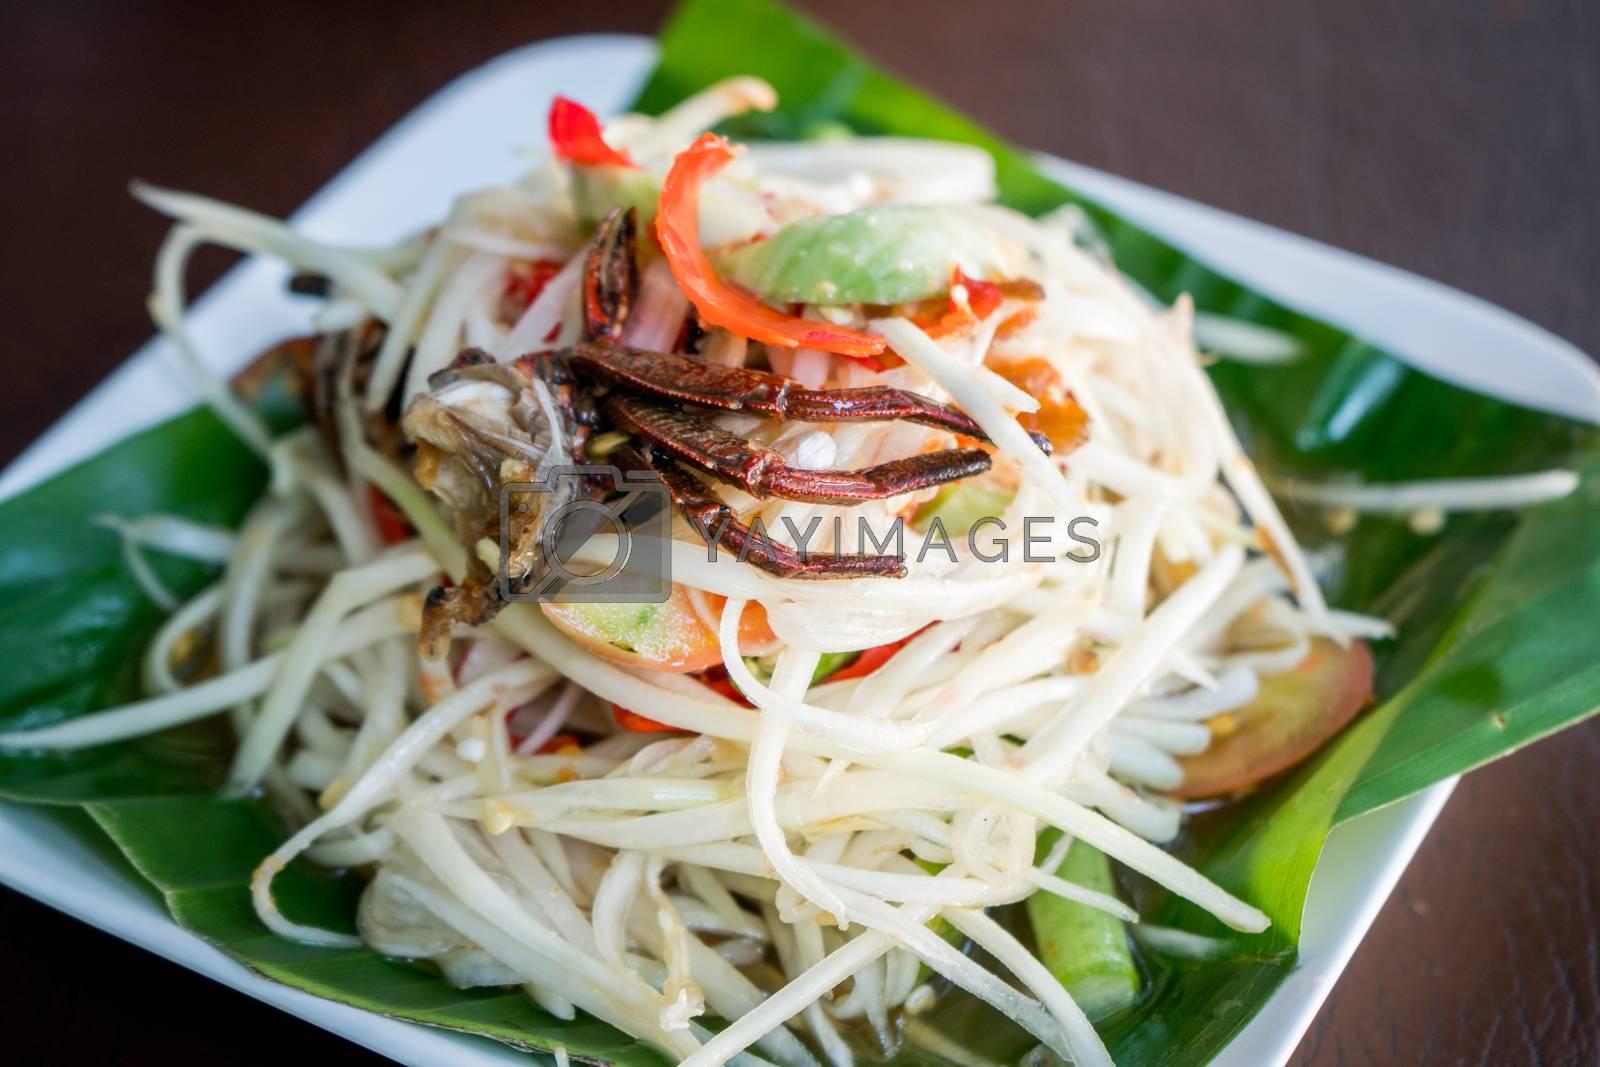 Royalty free image of papaya salad, som tum by antpkr